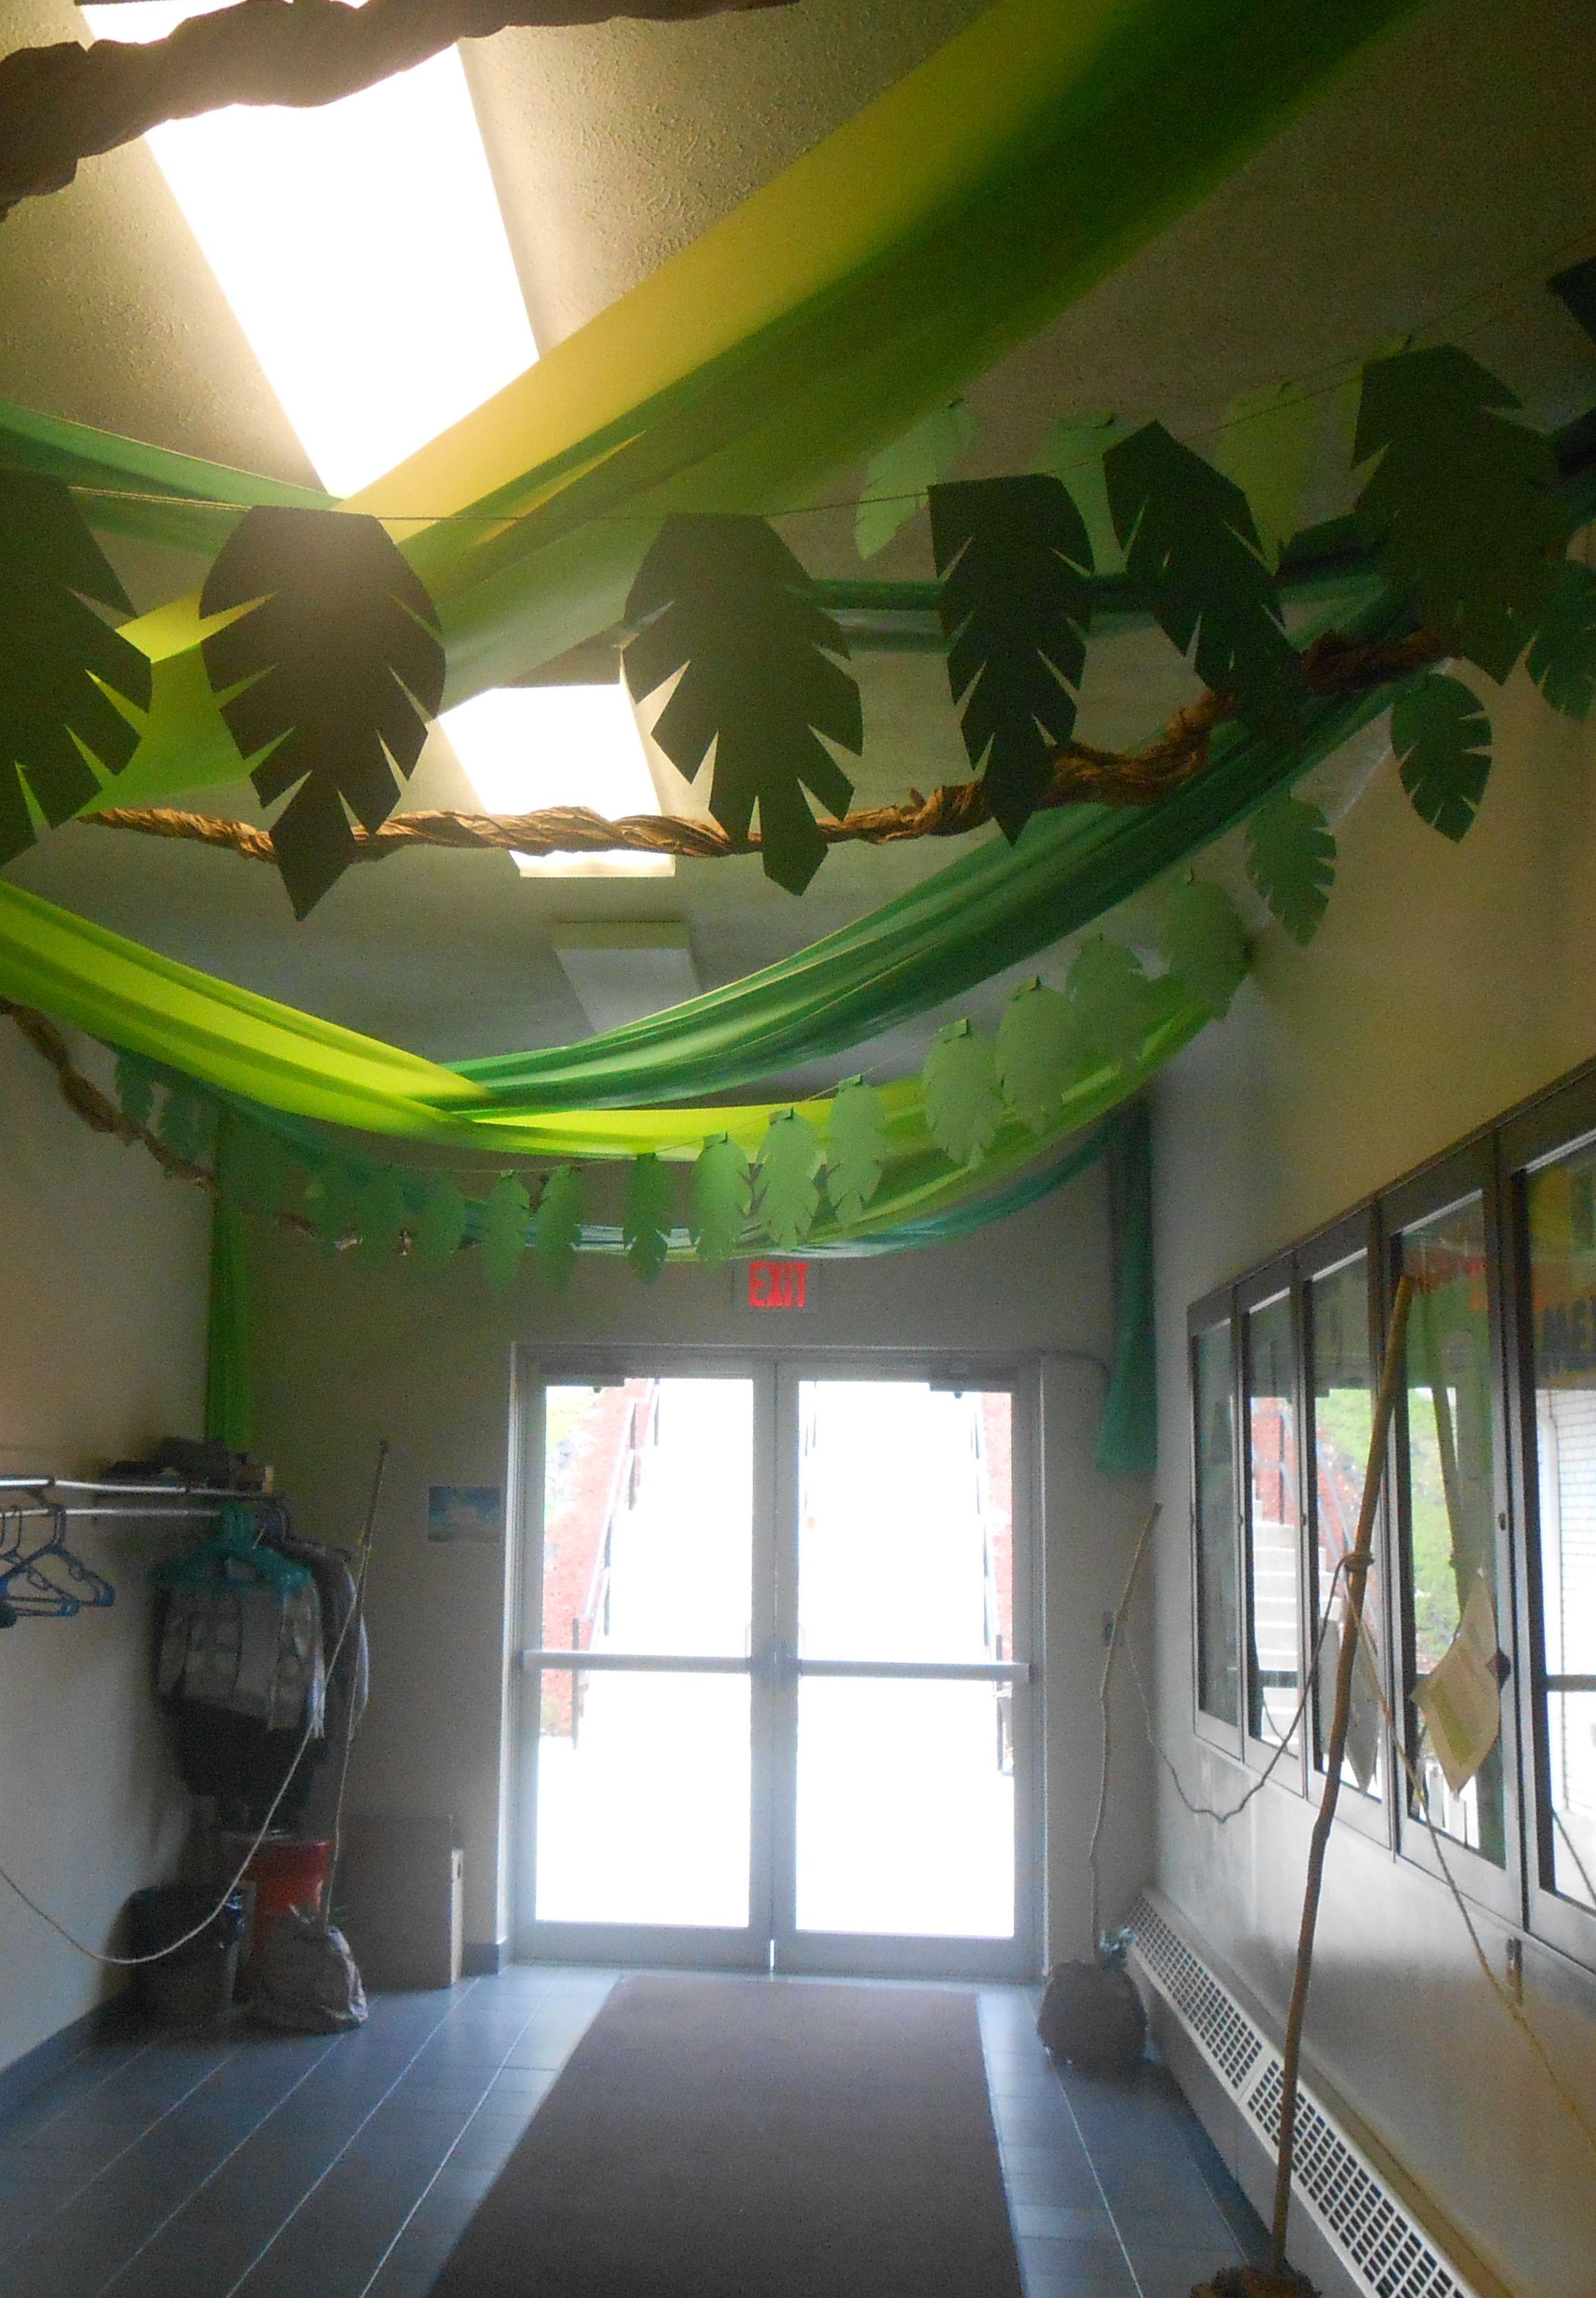 sonquest rainforest vbs decorations monkey classroom pinterest rh pinterest com Teacher Classroom Ideas Pinterest Teacher Classroom Ideas Pinterest